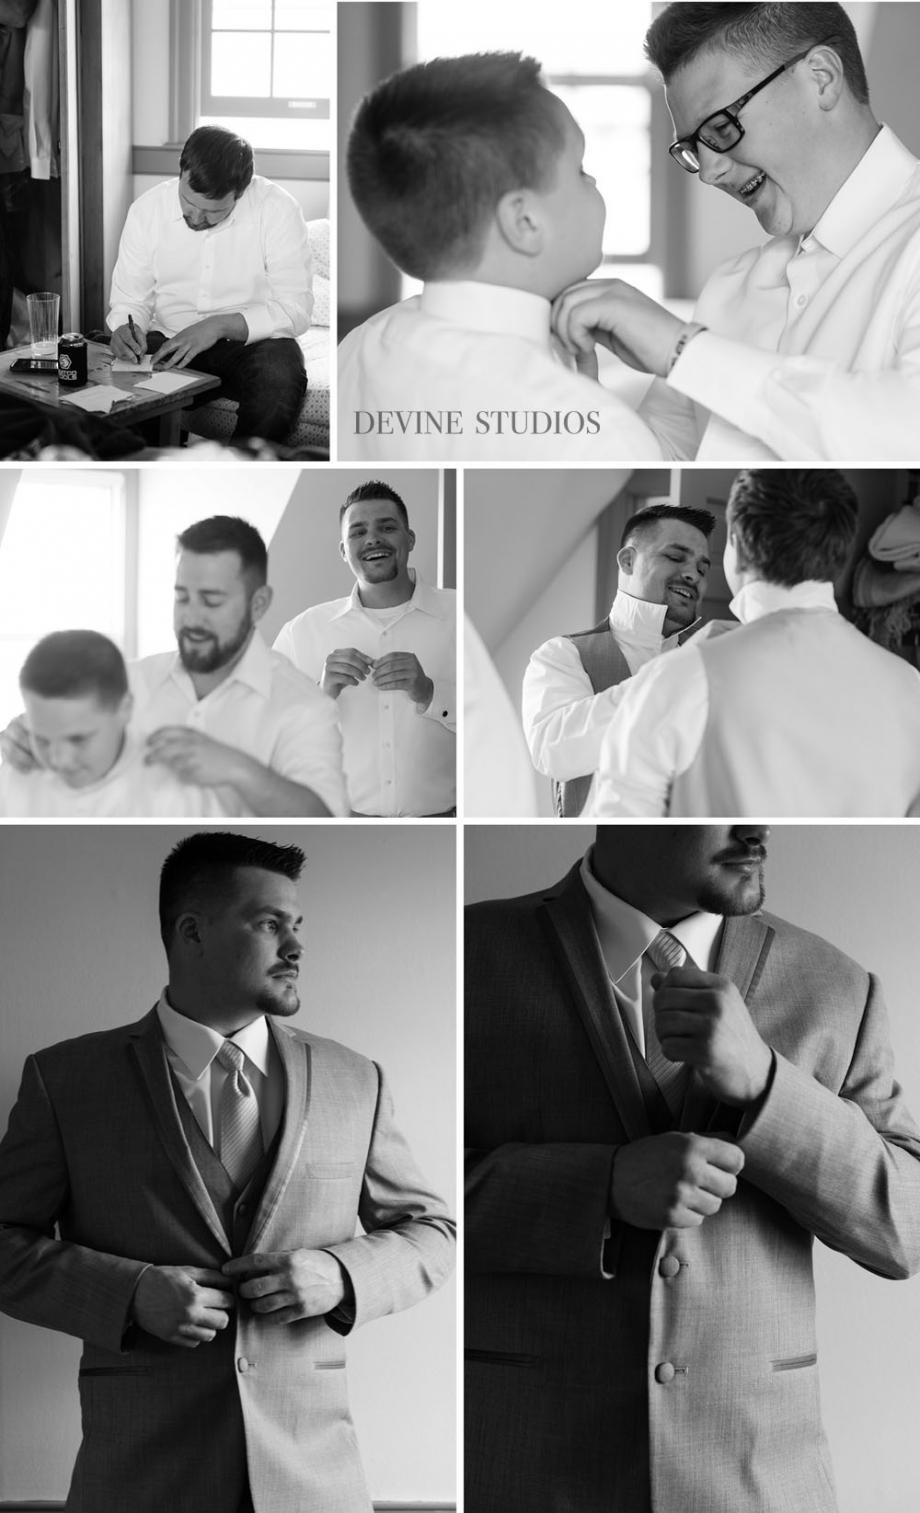 Kansas City-Wedding-Photography-Mildale Farm-Devine Studios2